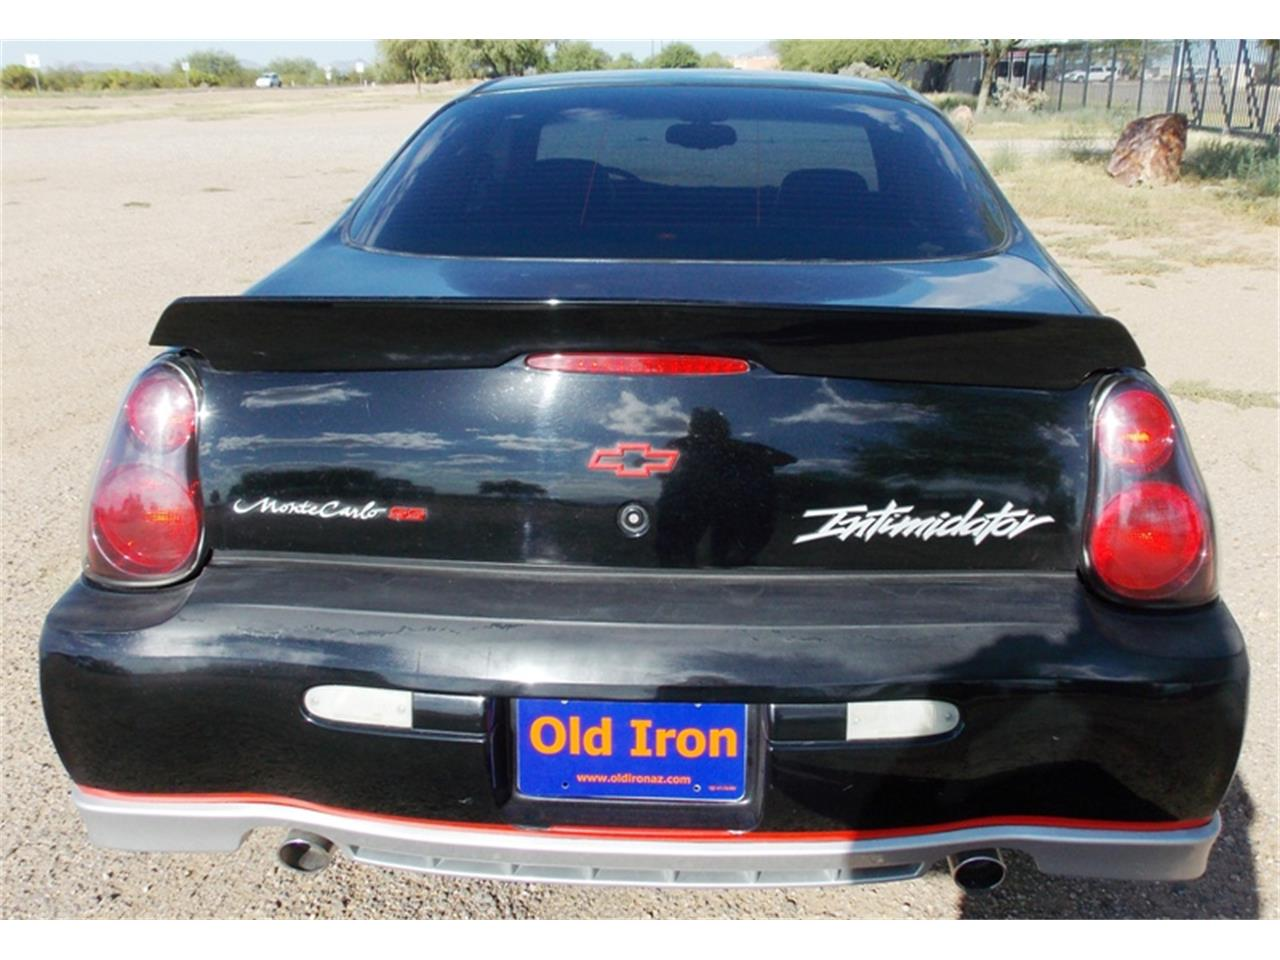 2002 Chevrolet Monte Carlo SS Intimidator (CC-1255024) for sale in Tucson, AZ - Arizona